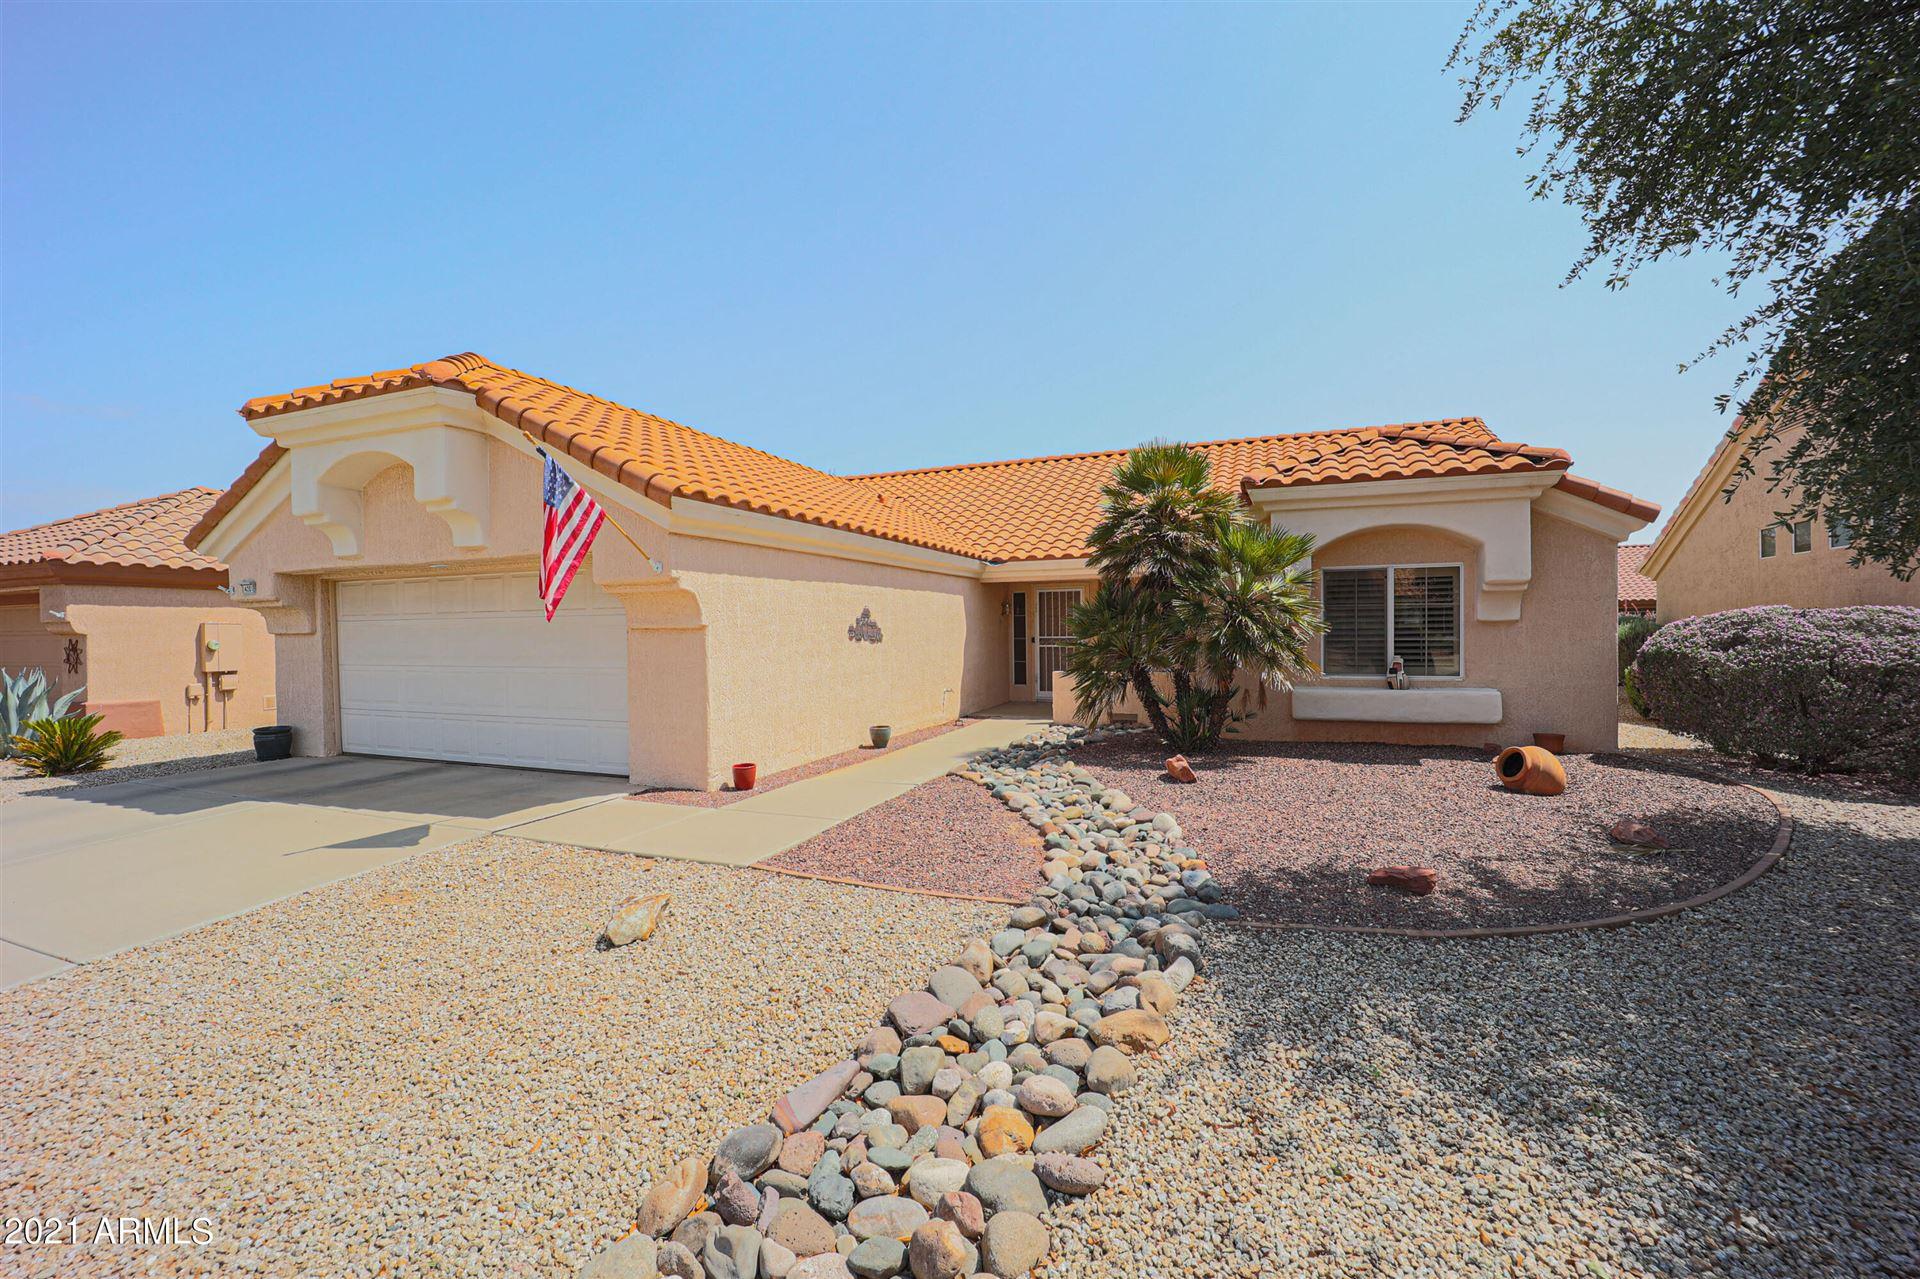 Photo of 14201 W VIA MANANA --, Sun City West, AZ 85375 (MLS # 6266036)